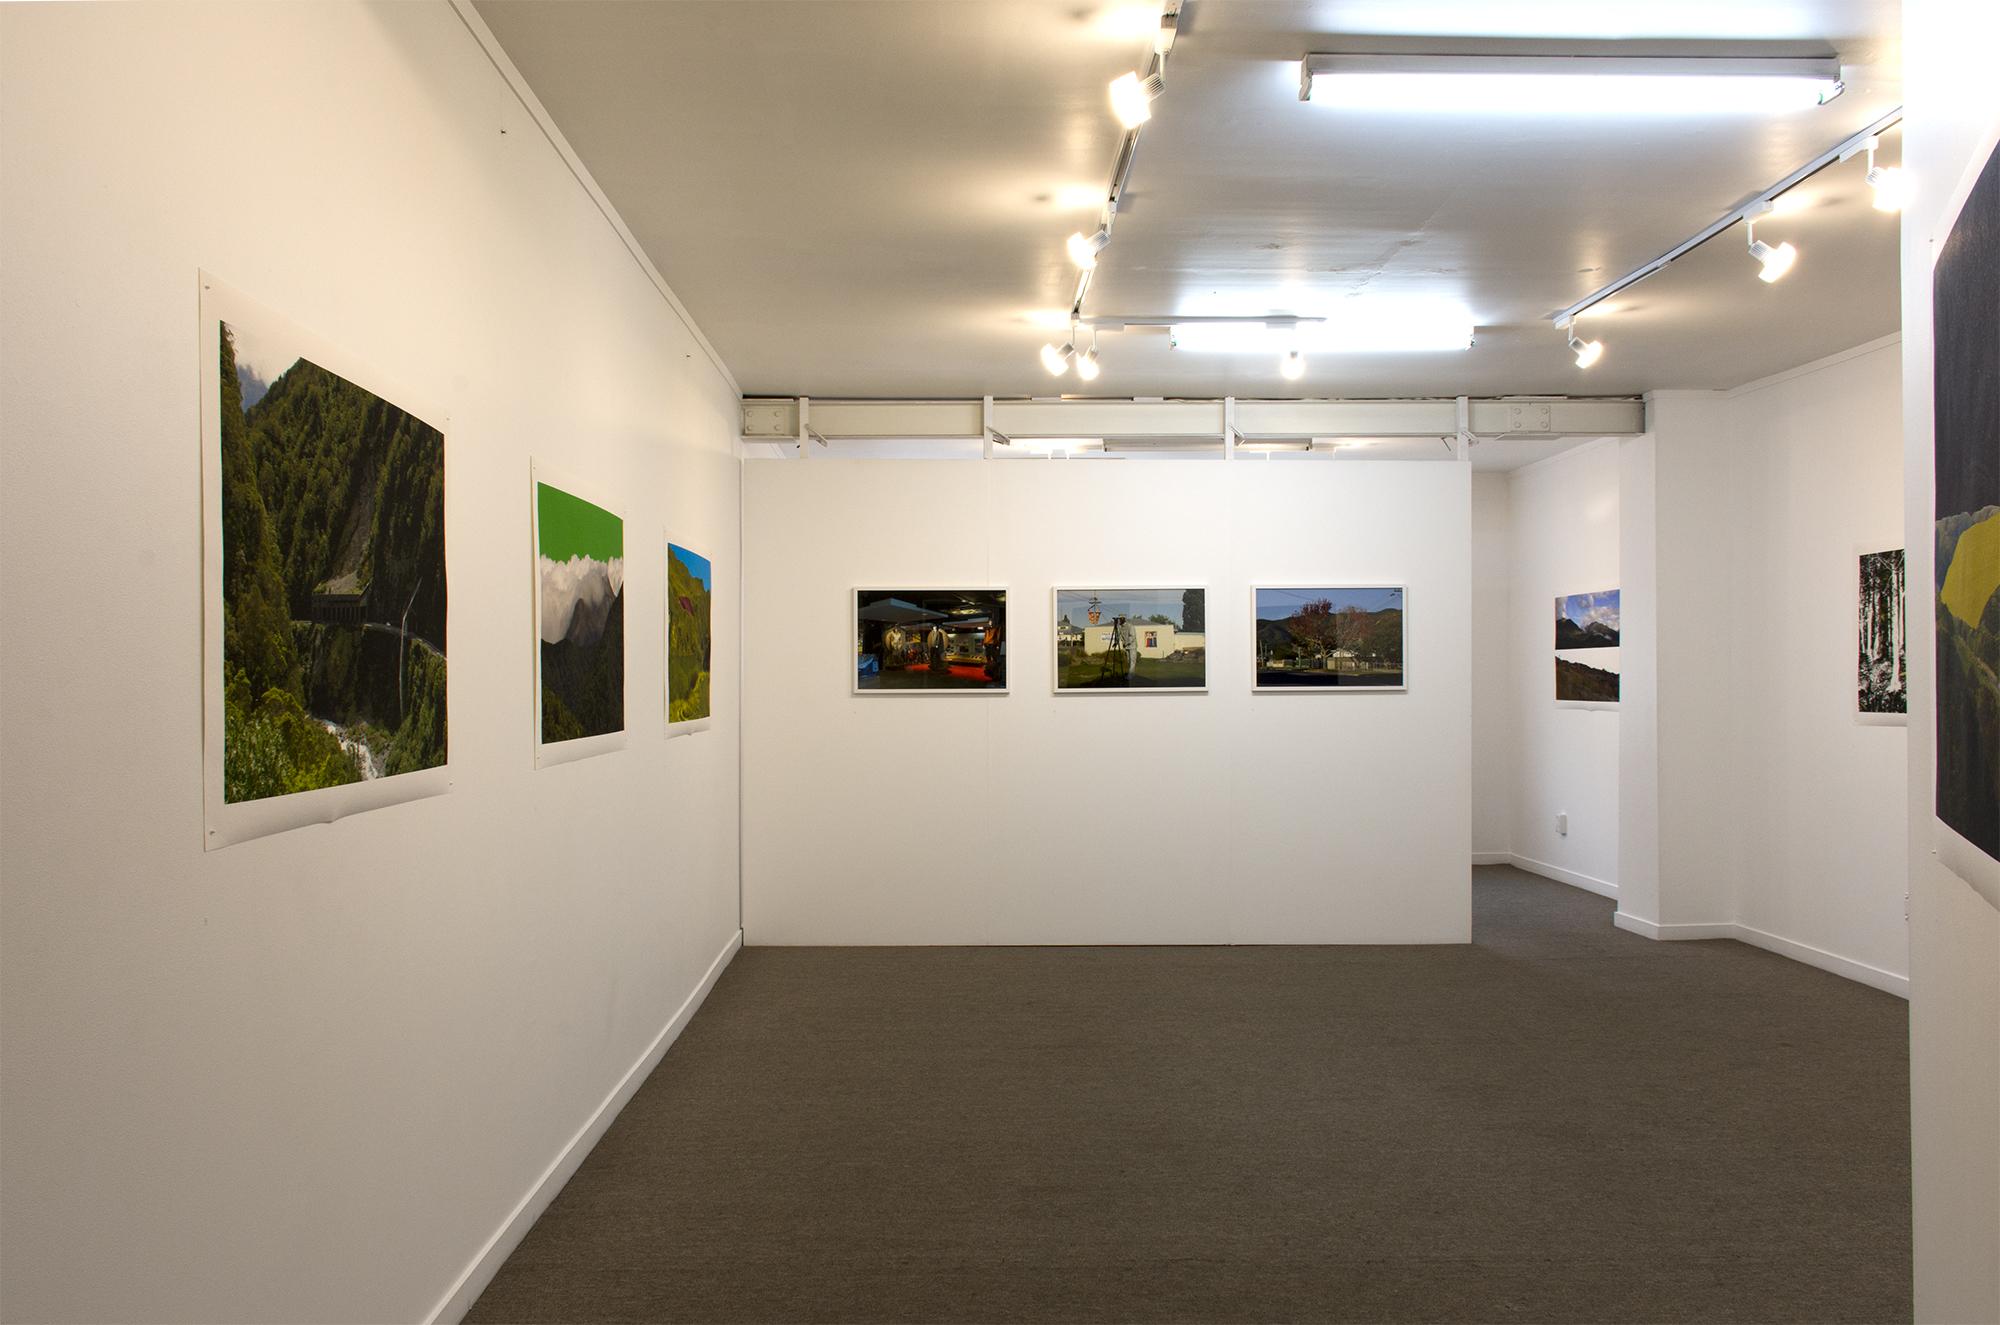 Photospace Gallery Wellington March/April 2017 #1